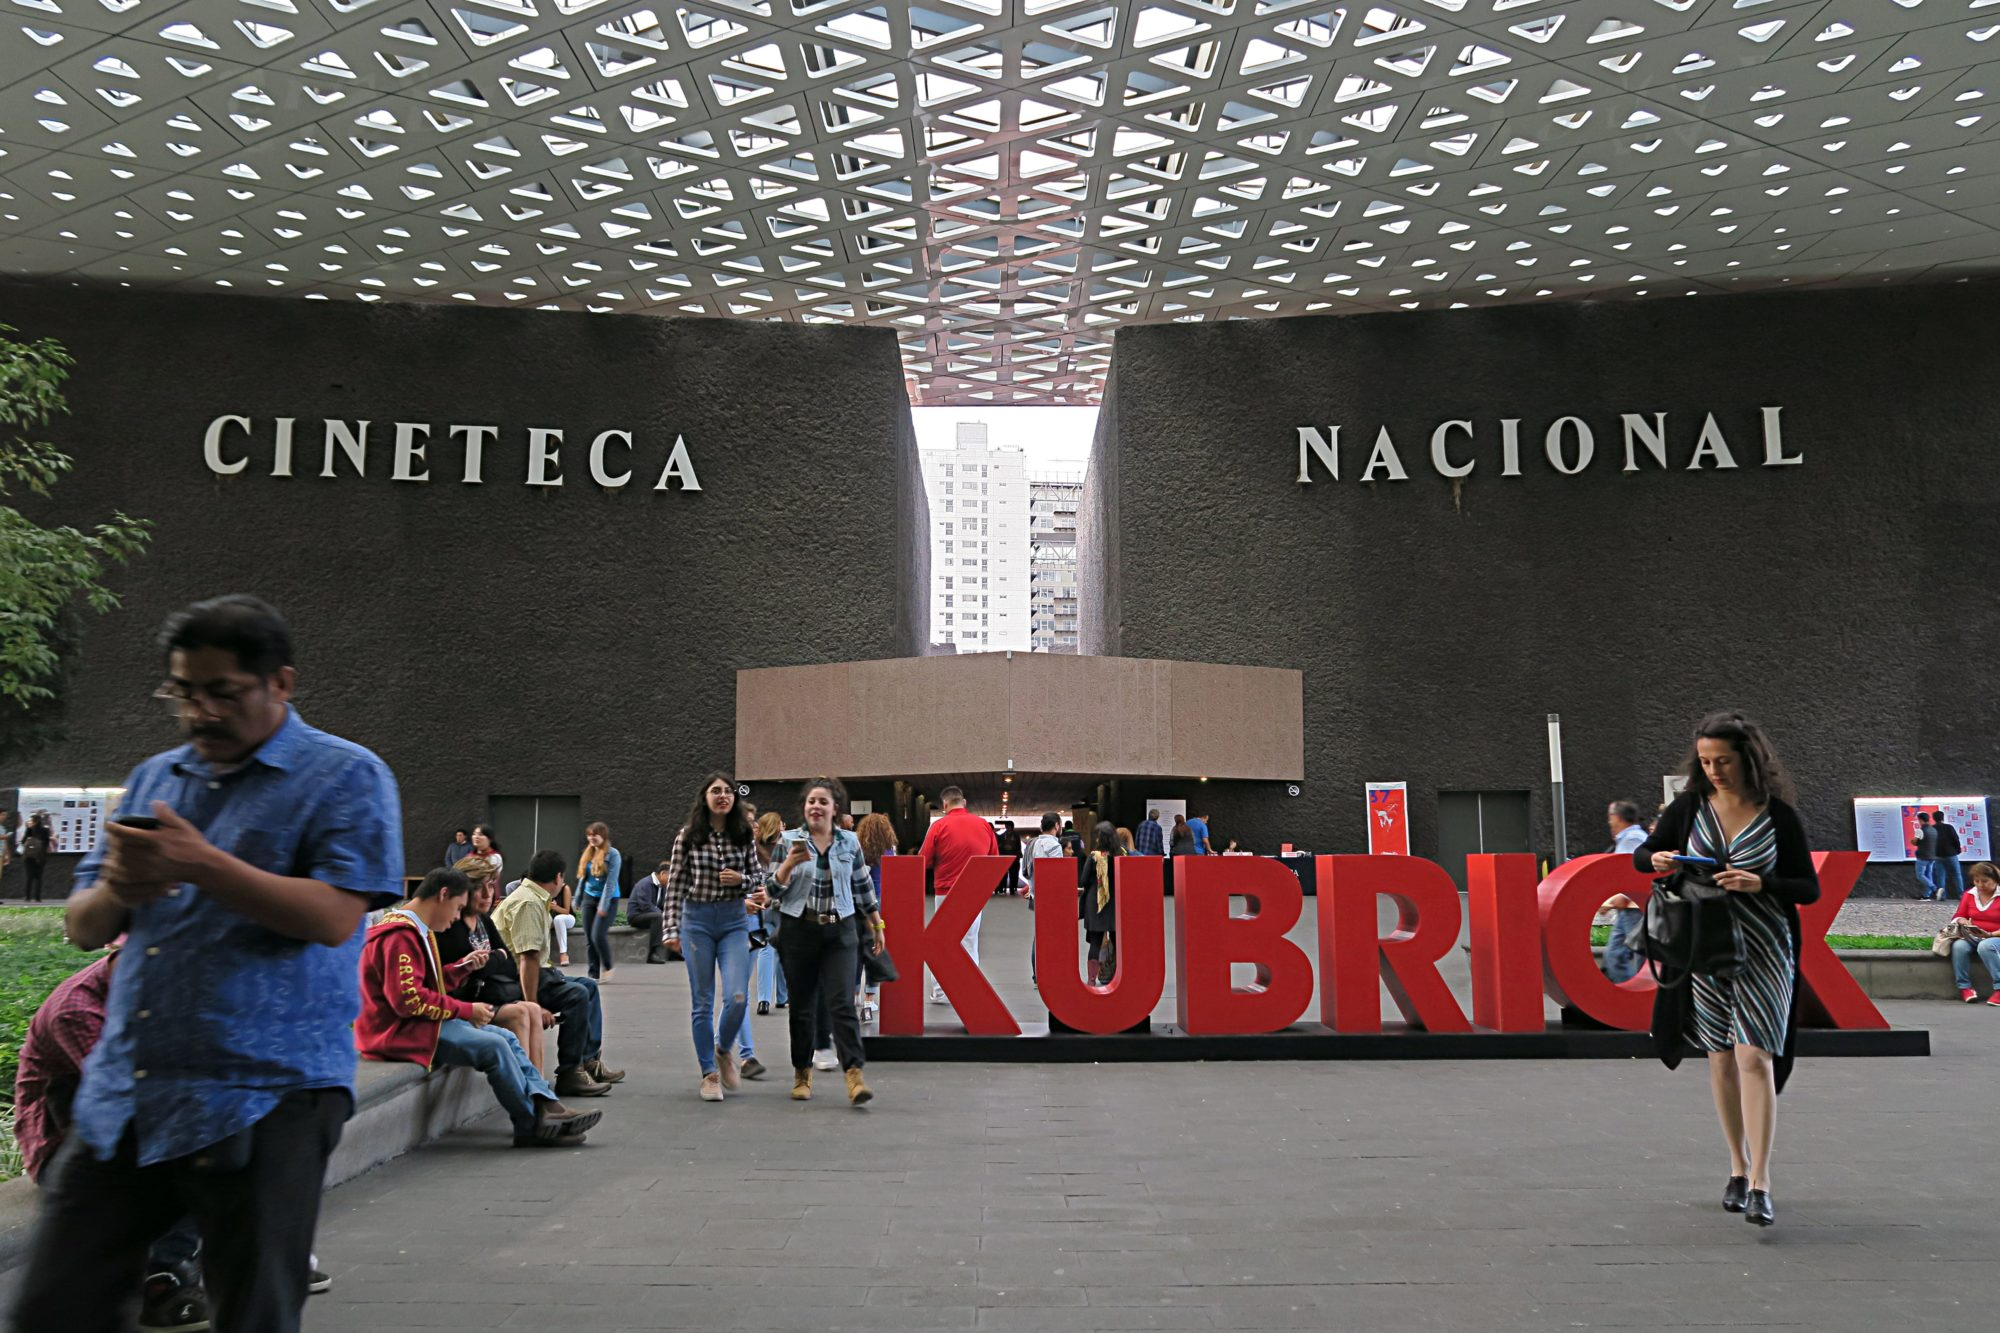 mexiko_stadt_kubrick